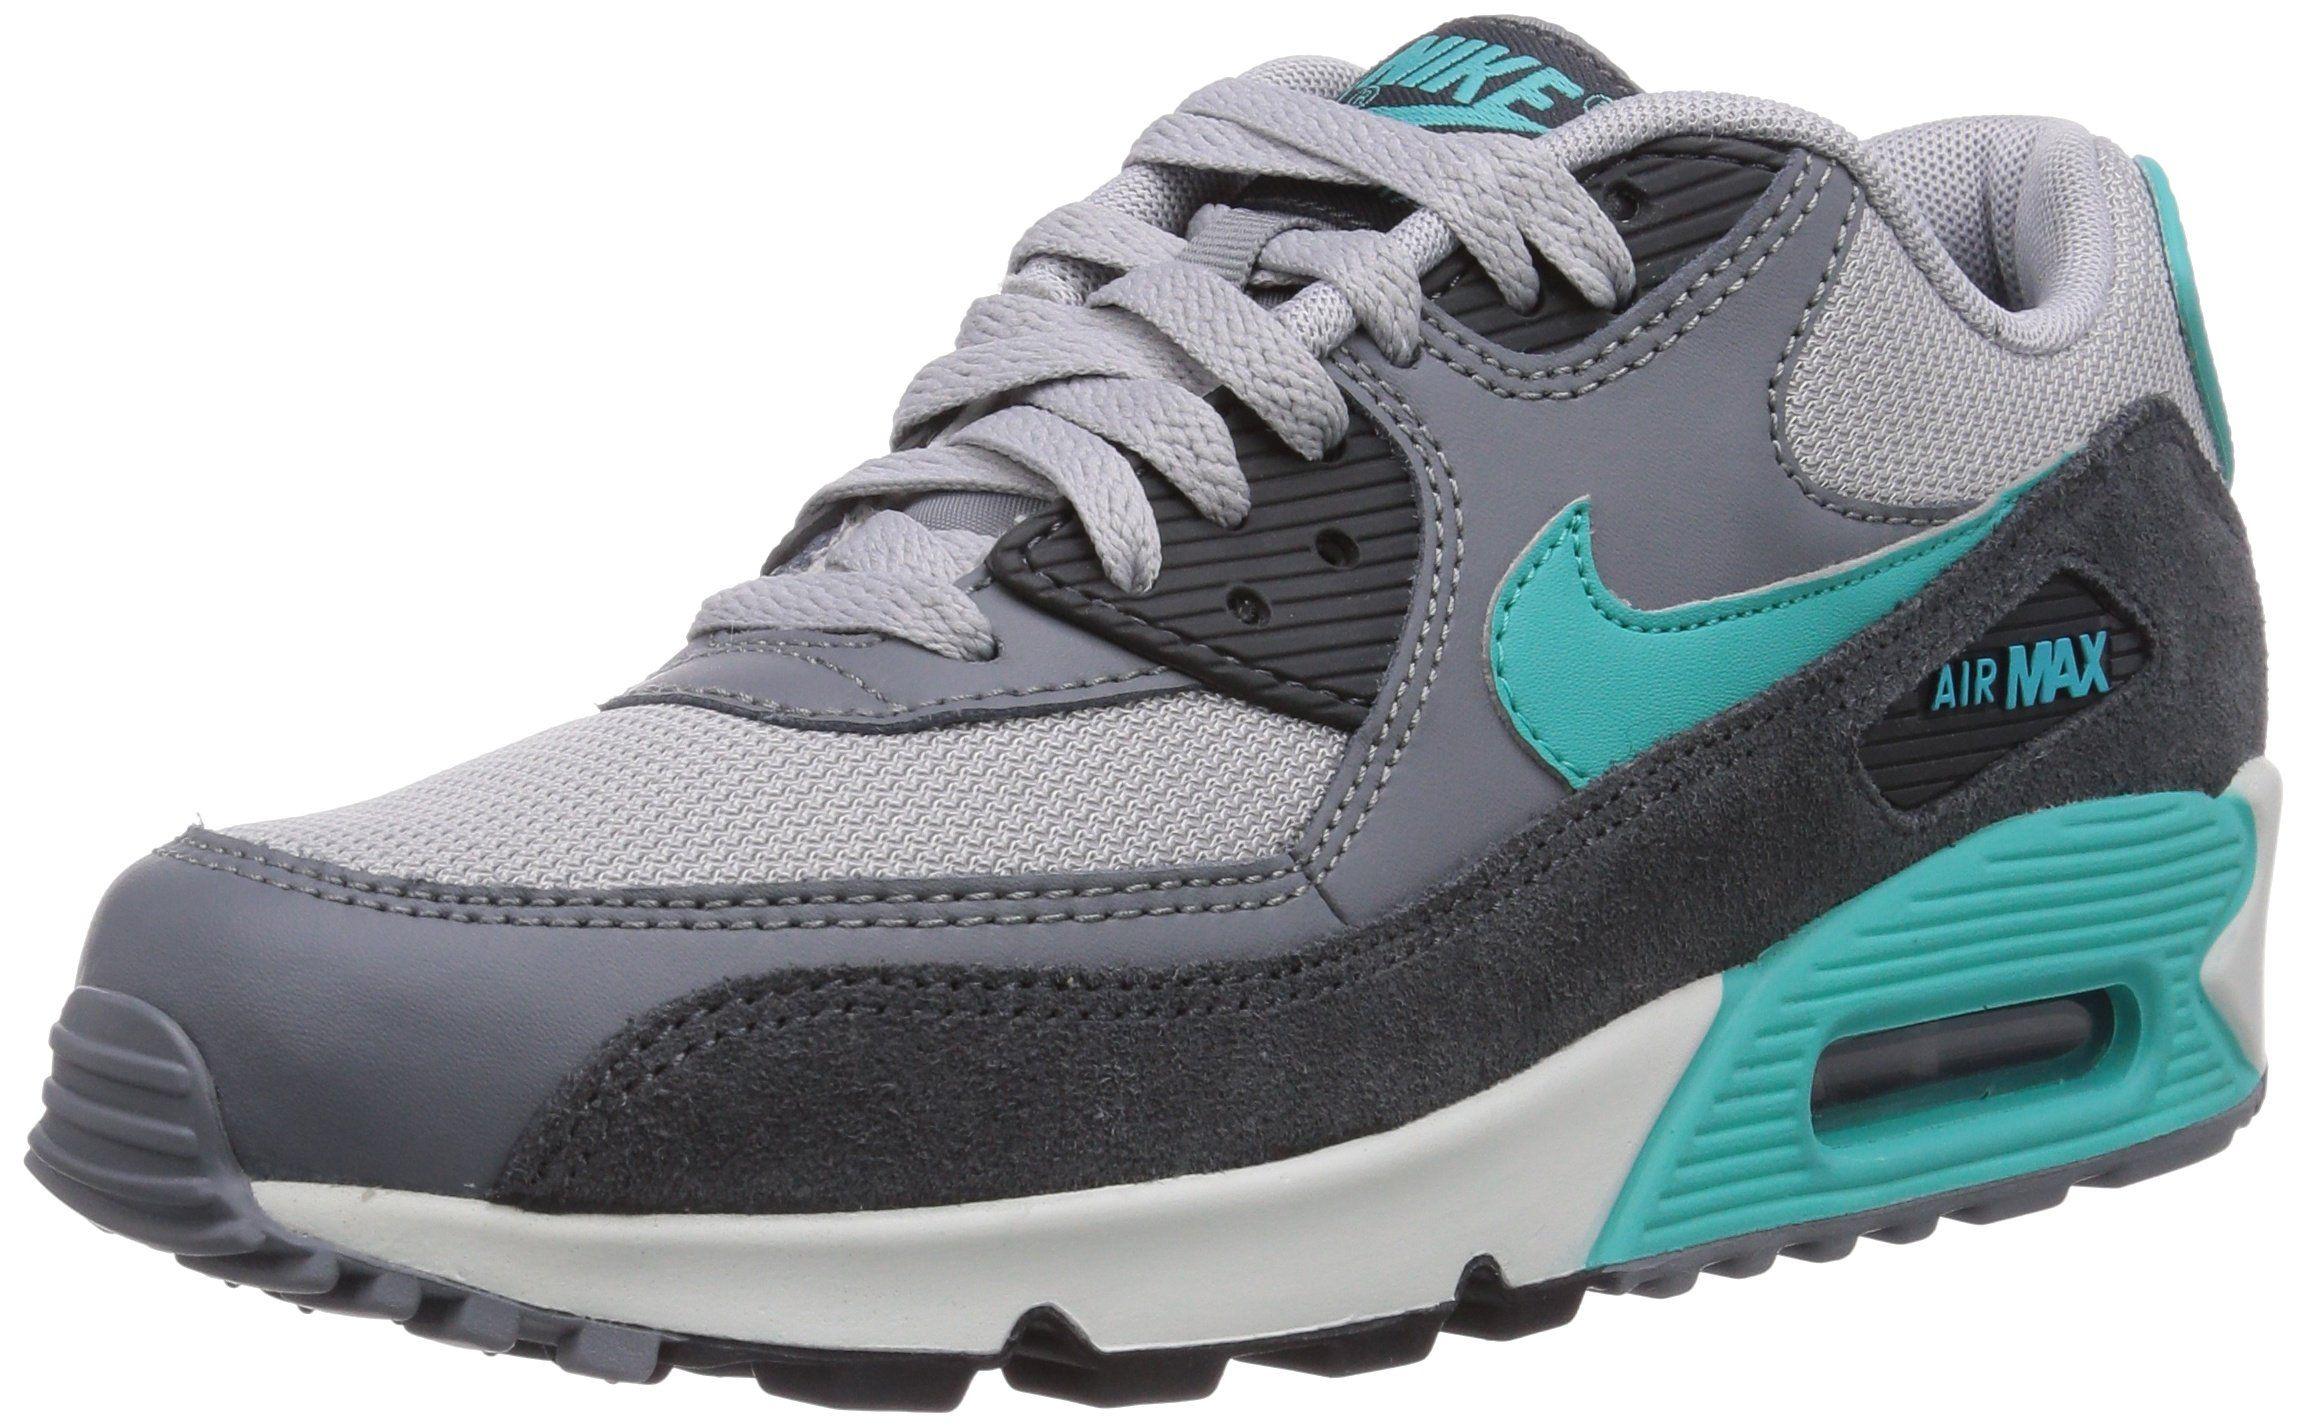 Nike Herren Air Max 90 Essential Low Top: Schuhe & Handtaschen